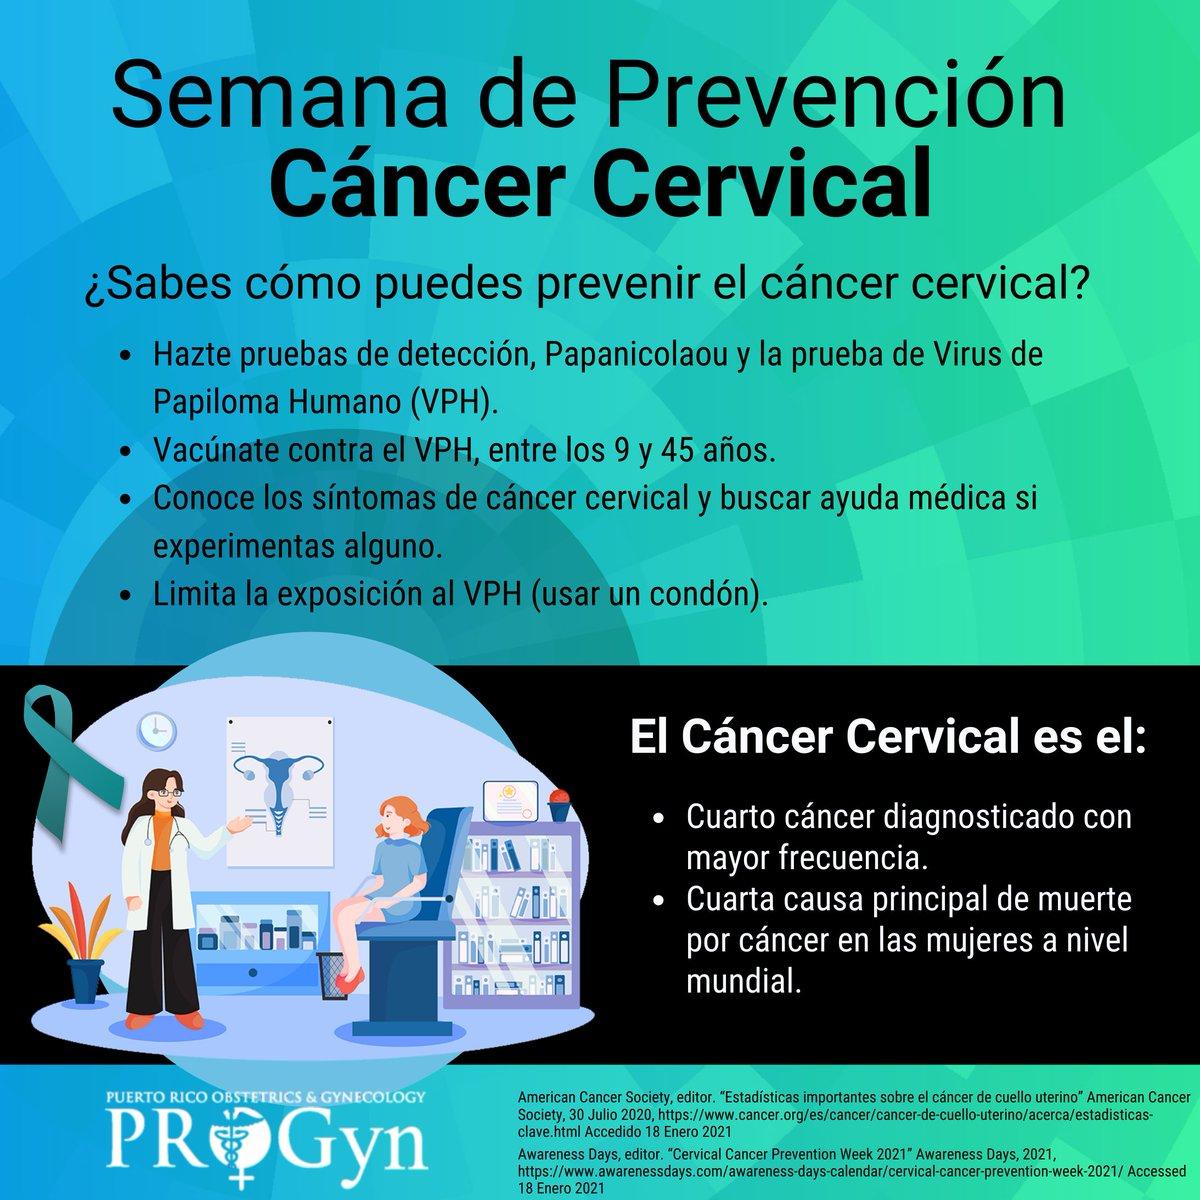 En la semana de la prevención del Cáncer Cervical, queremos darte algunas maneras de prevenir el cáncer cervical. Haz tu cita, consulta con tu ginecólogo. #PROGyn #PROGynContigo #MATERR #CáncerCervical #CervicalCancerAwareness #Papanicolaou #HPV